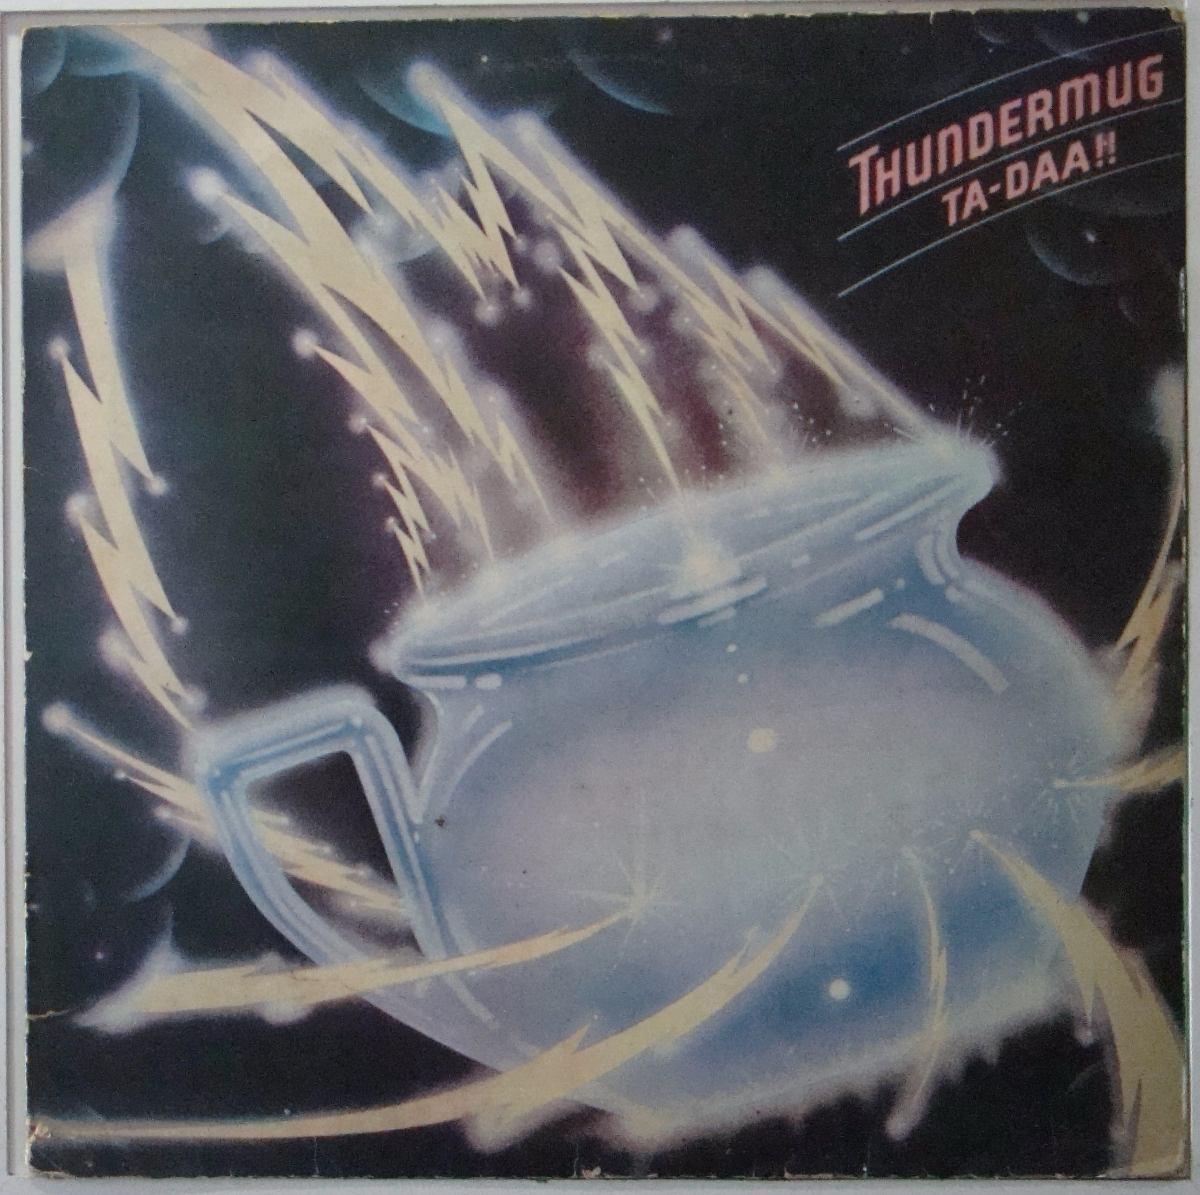 Lp Thundermug - Ta-daa - 1975 - Mercury